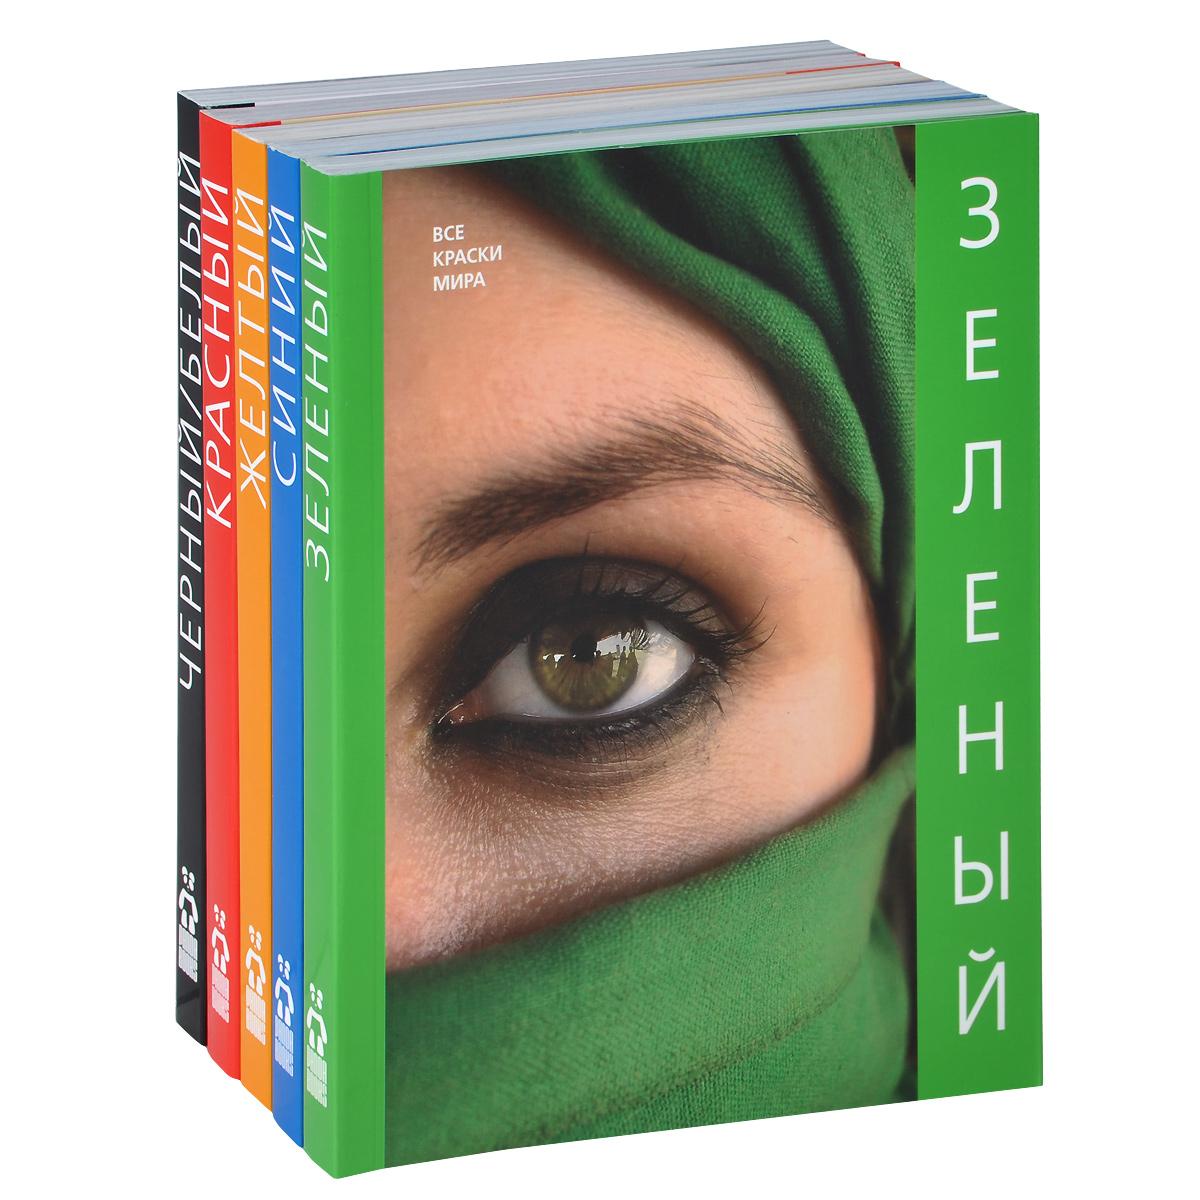 Все краски мира (комплект из 5 книг)